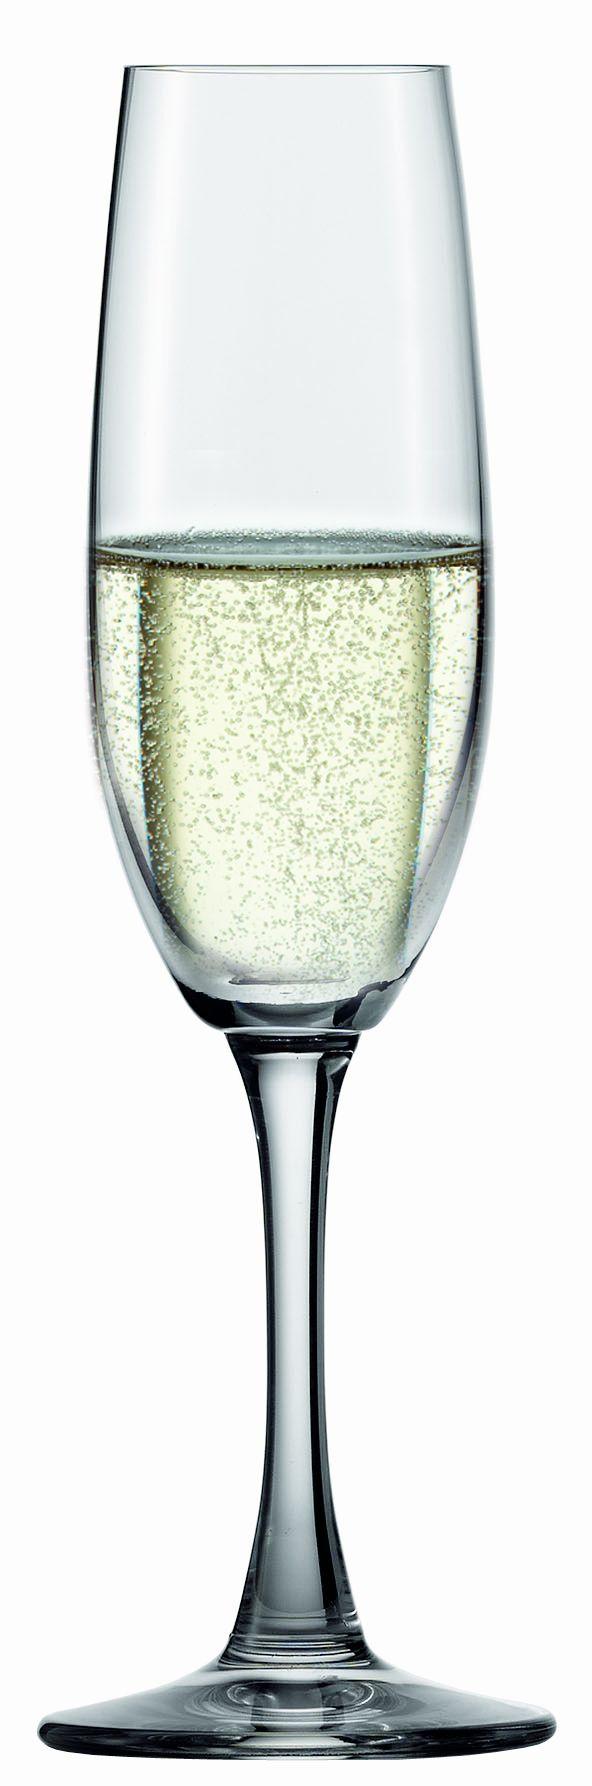 Licores maduro - Spiegelau champagne flute ...